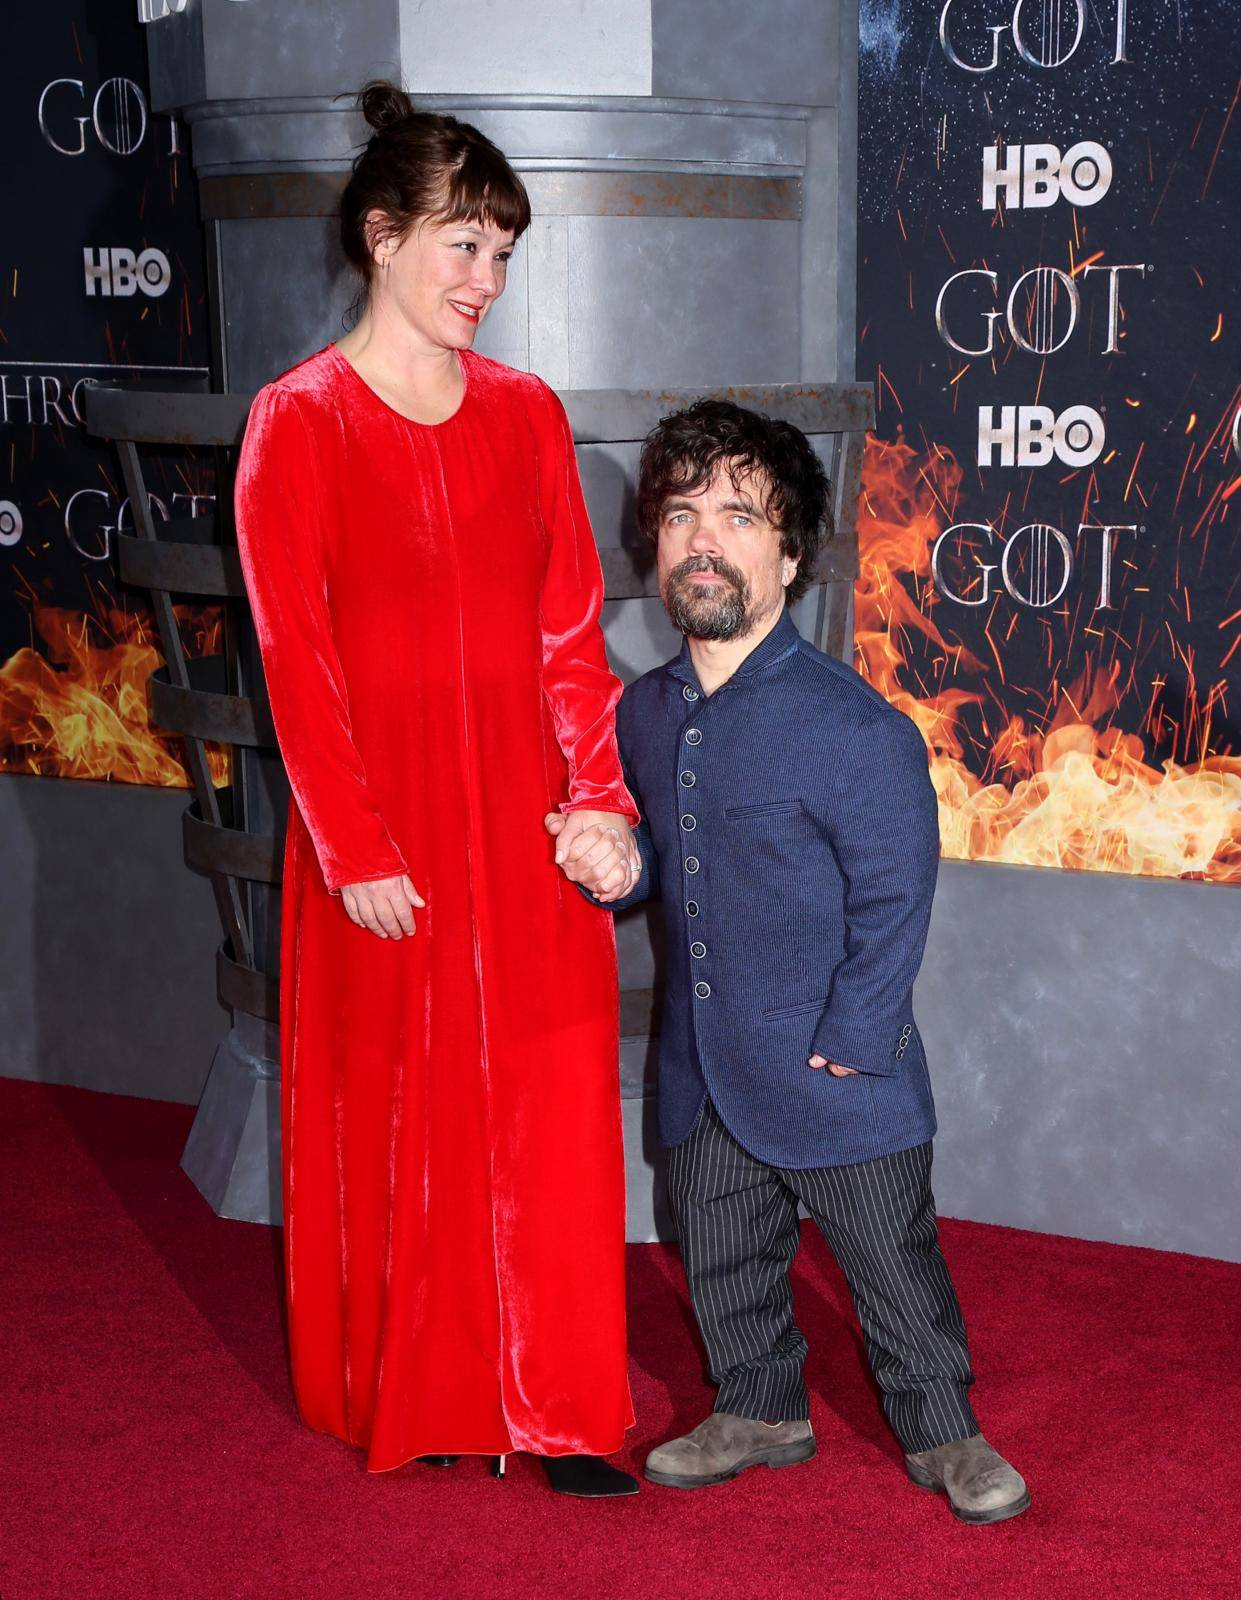 Game of Thrones Final Season World Premiere - New York